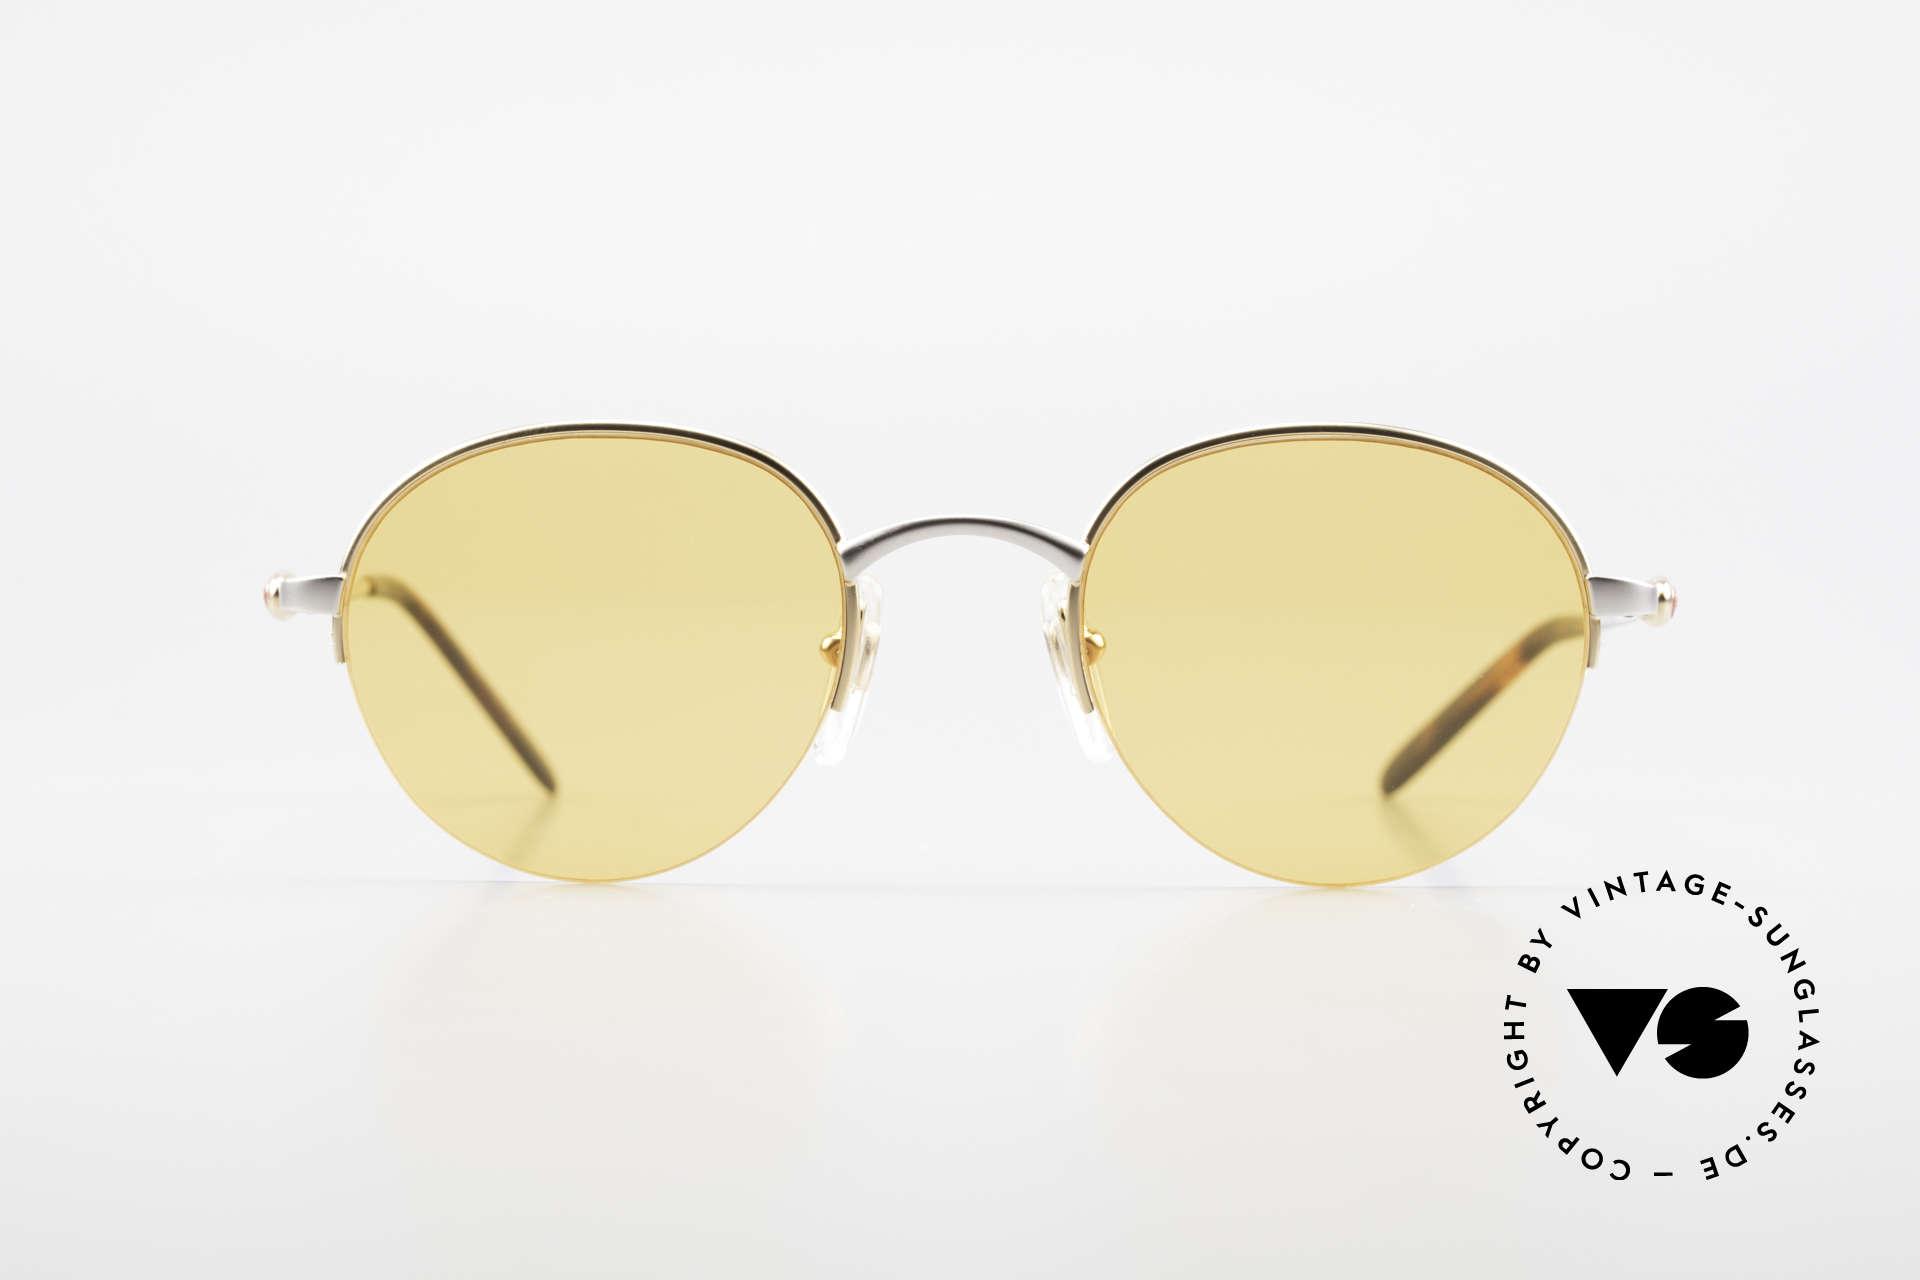 Bugatti 26658 90s Panto Designer Sunglasses, the Panto frame design is rarely to see at Bugatti, Made for Men